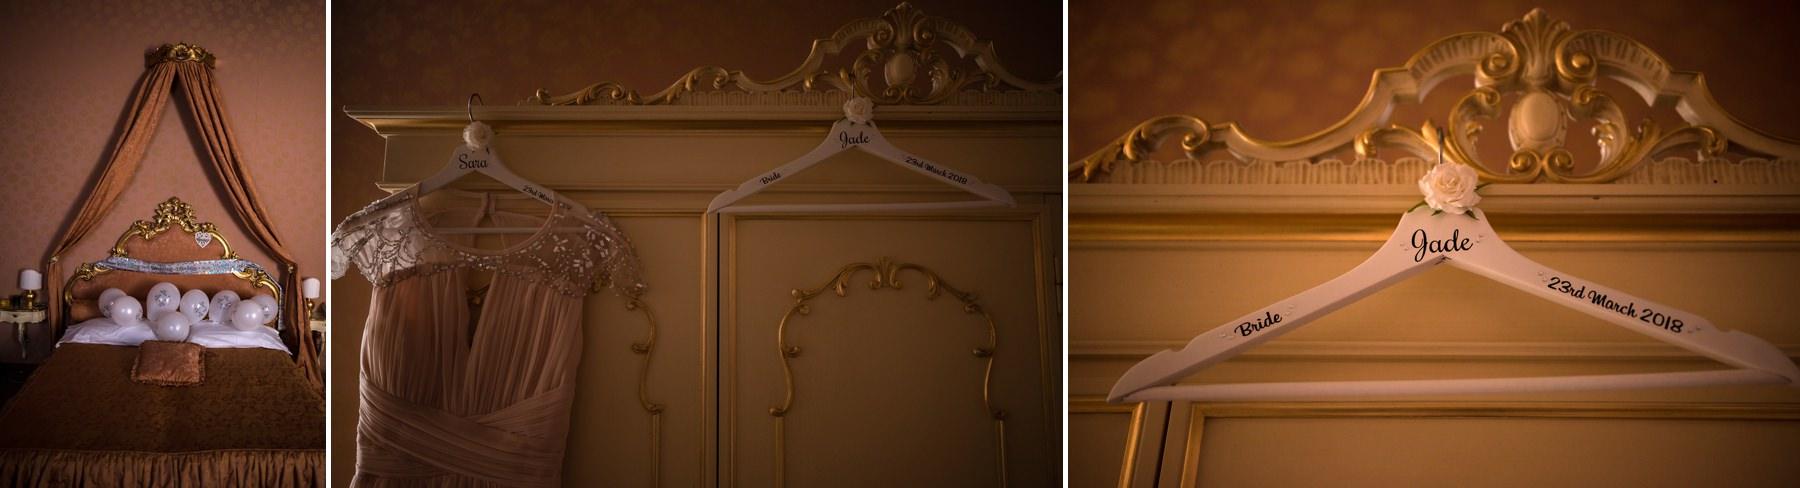 Palazzo Cavalli Venice bride details in room